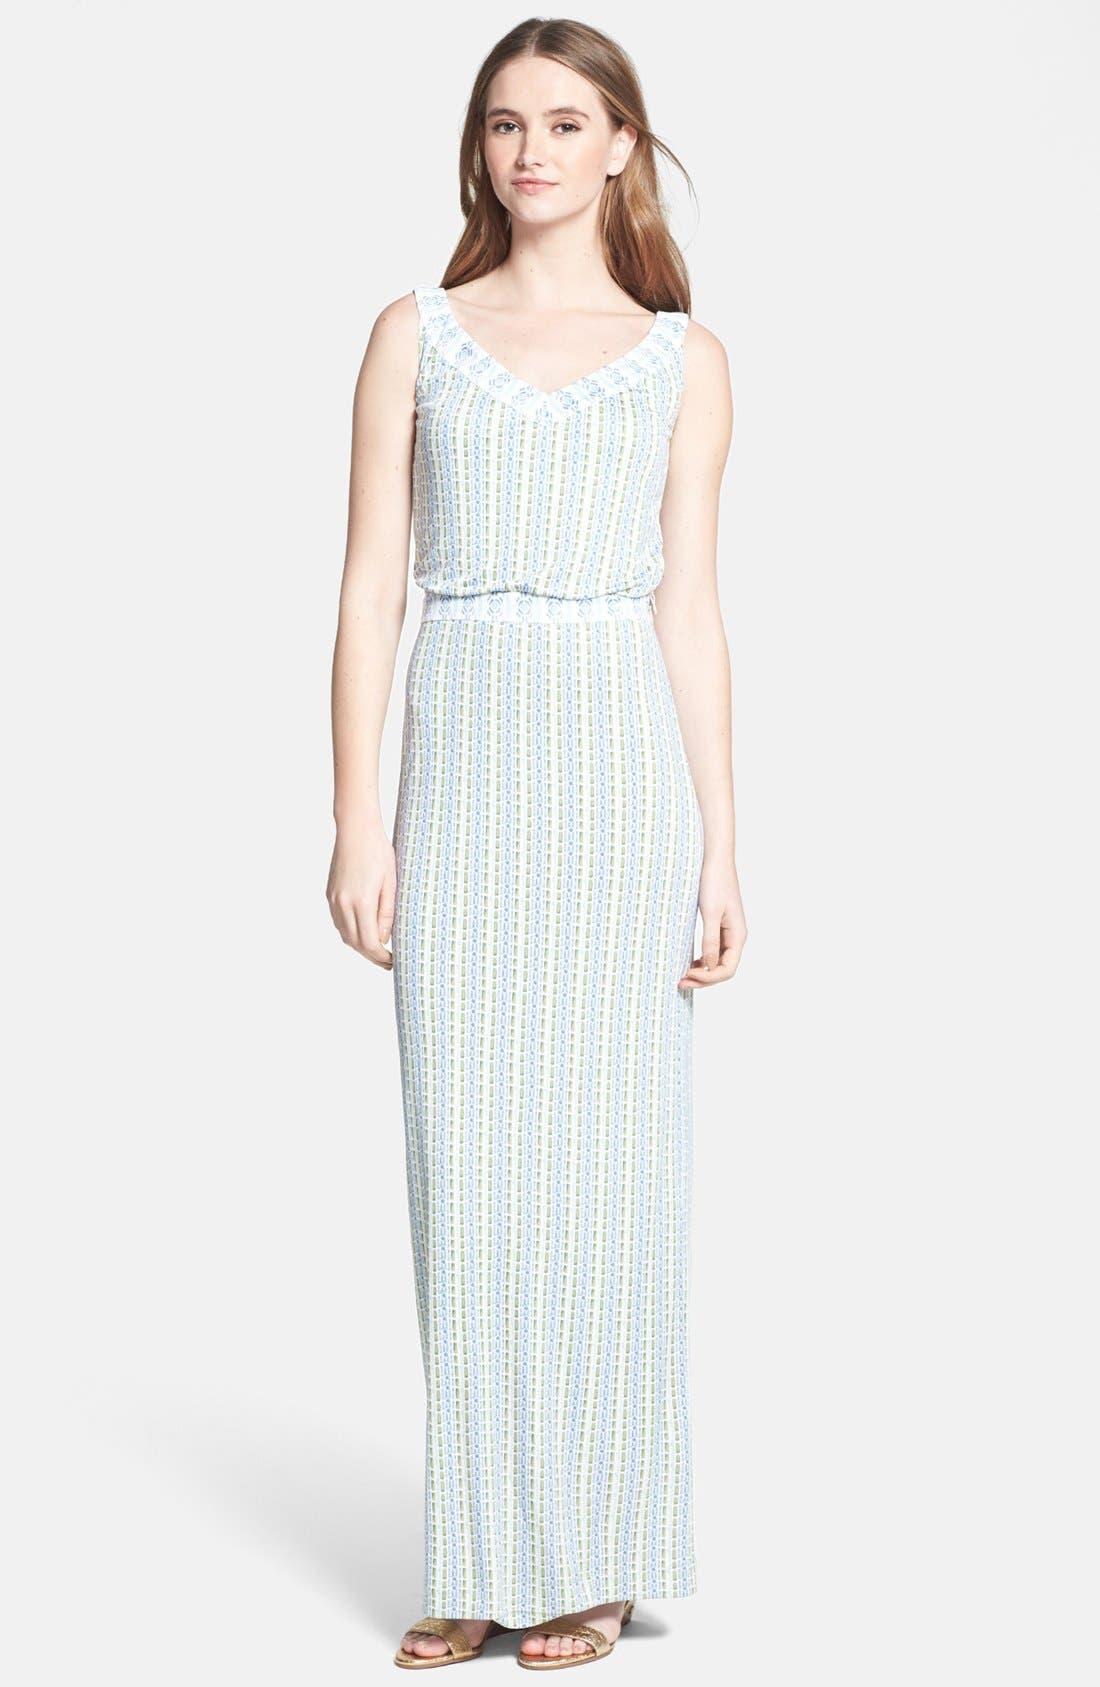 Alternate Image 1 Selected - Tory Burch 'Micky' Silk Blouson Maxi Dress